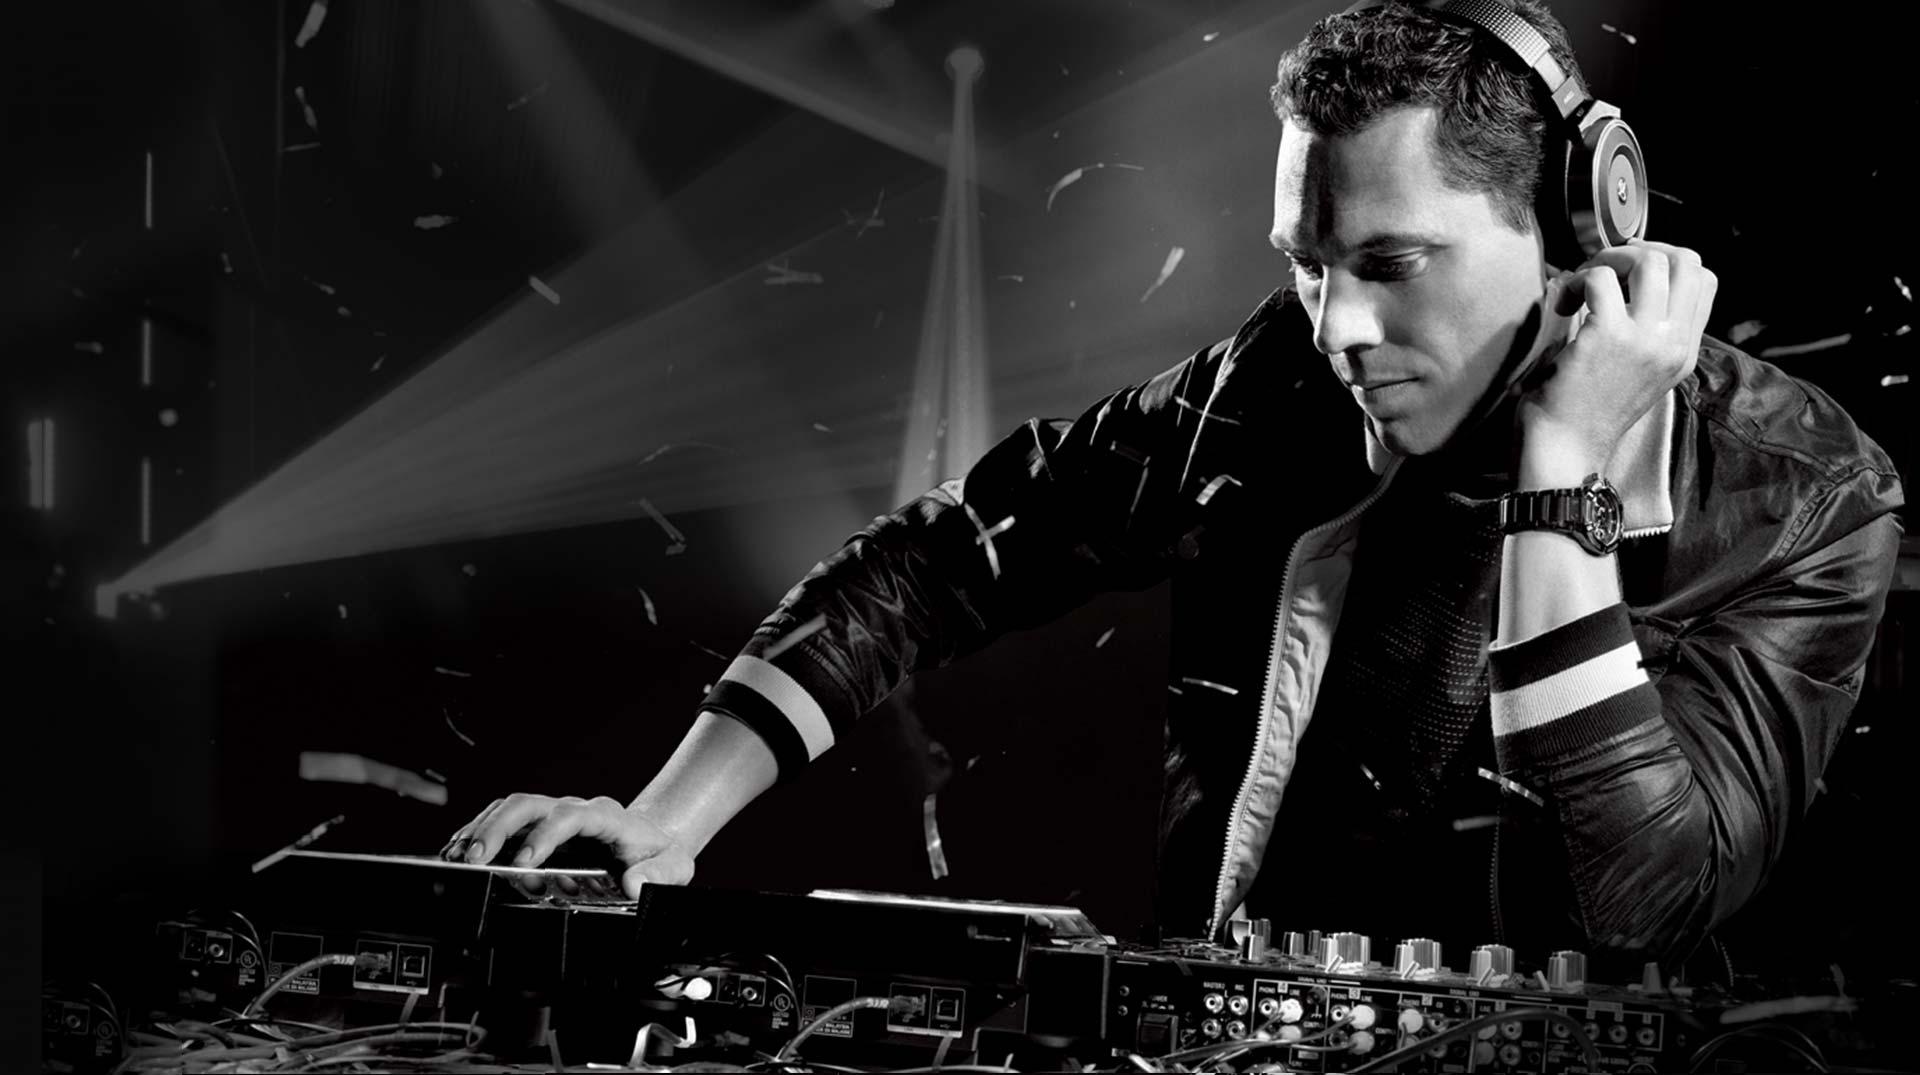 Tiësto DJing